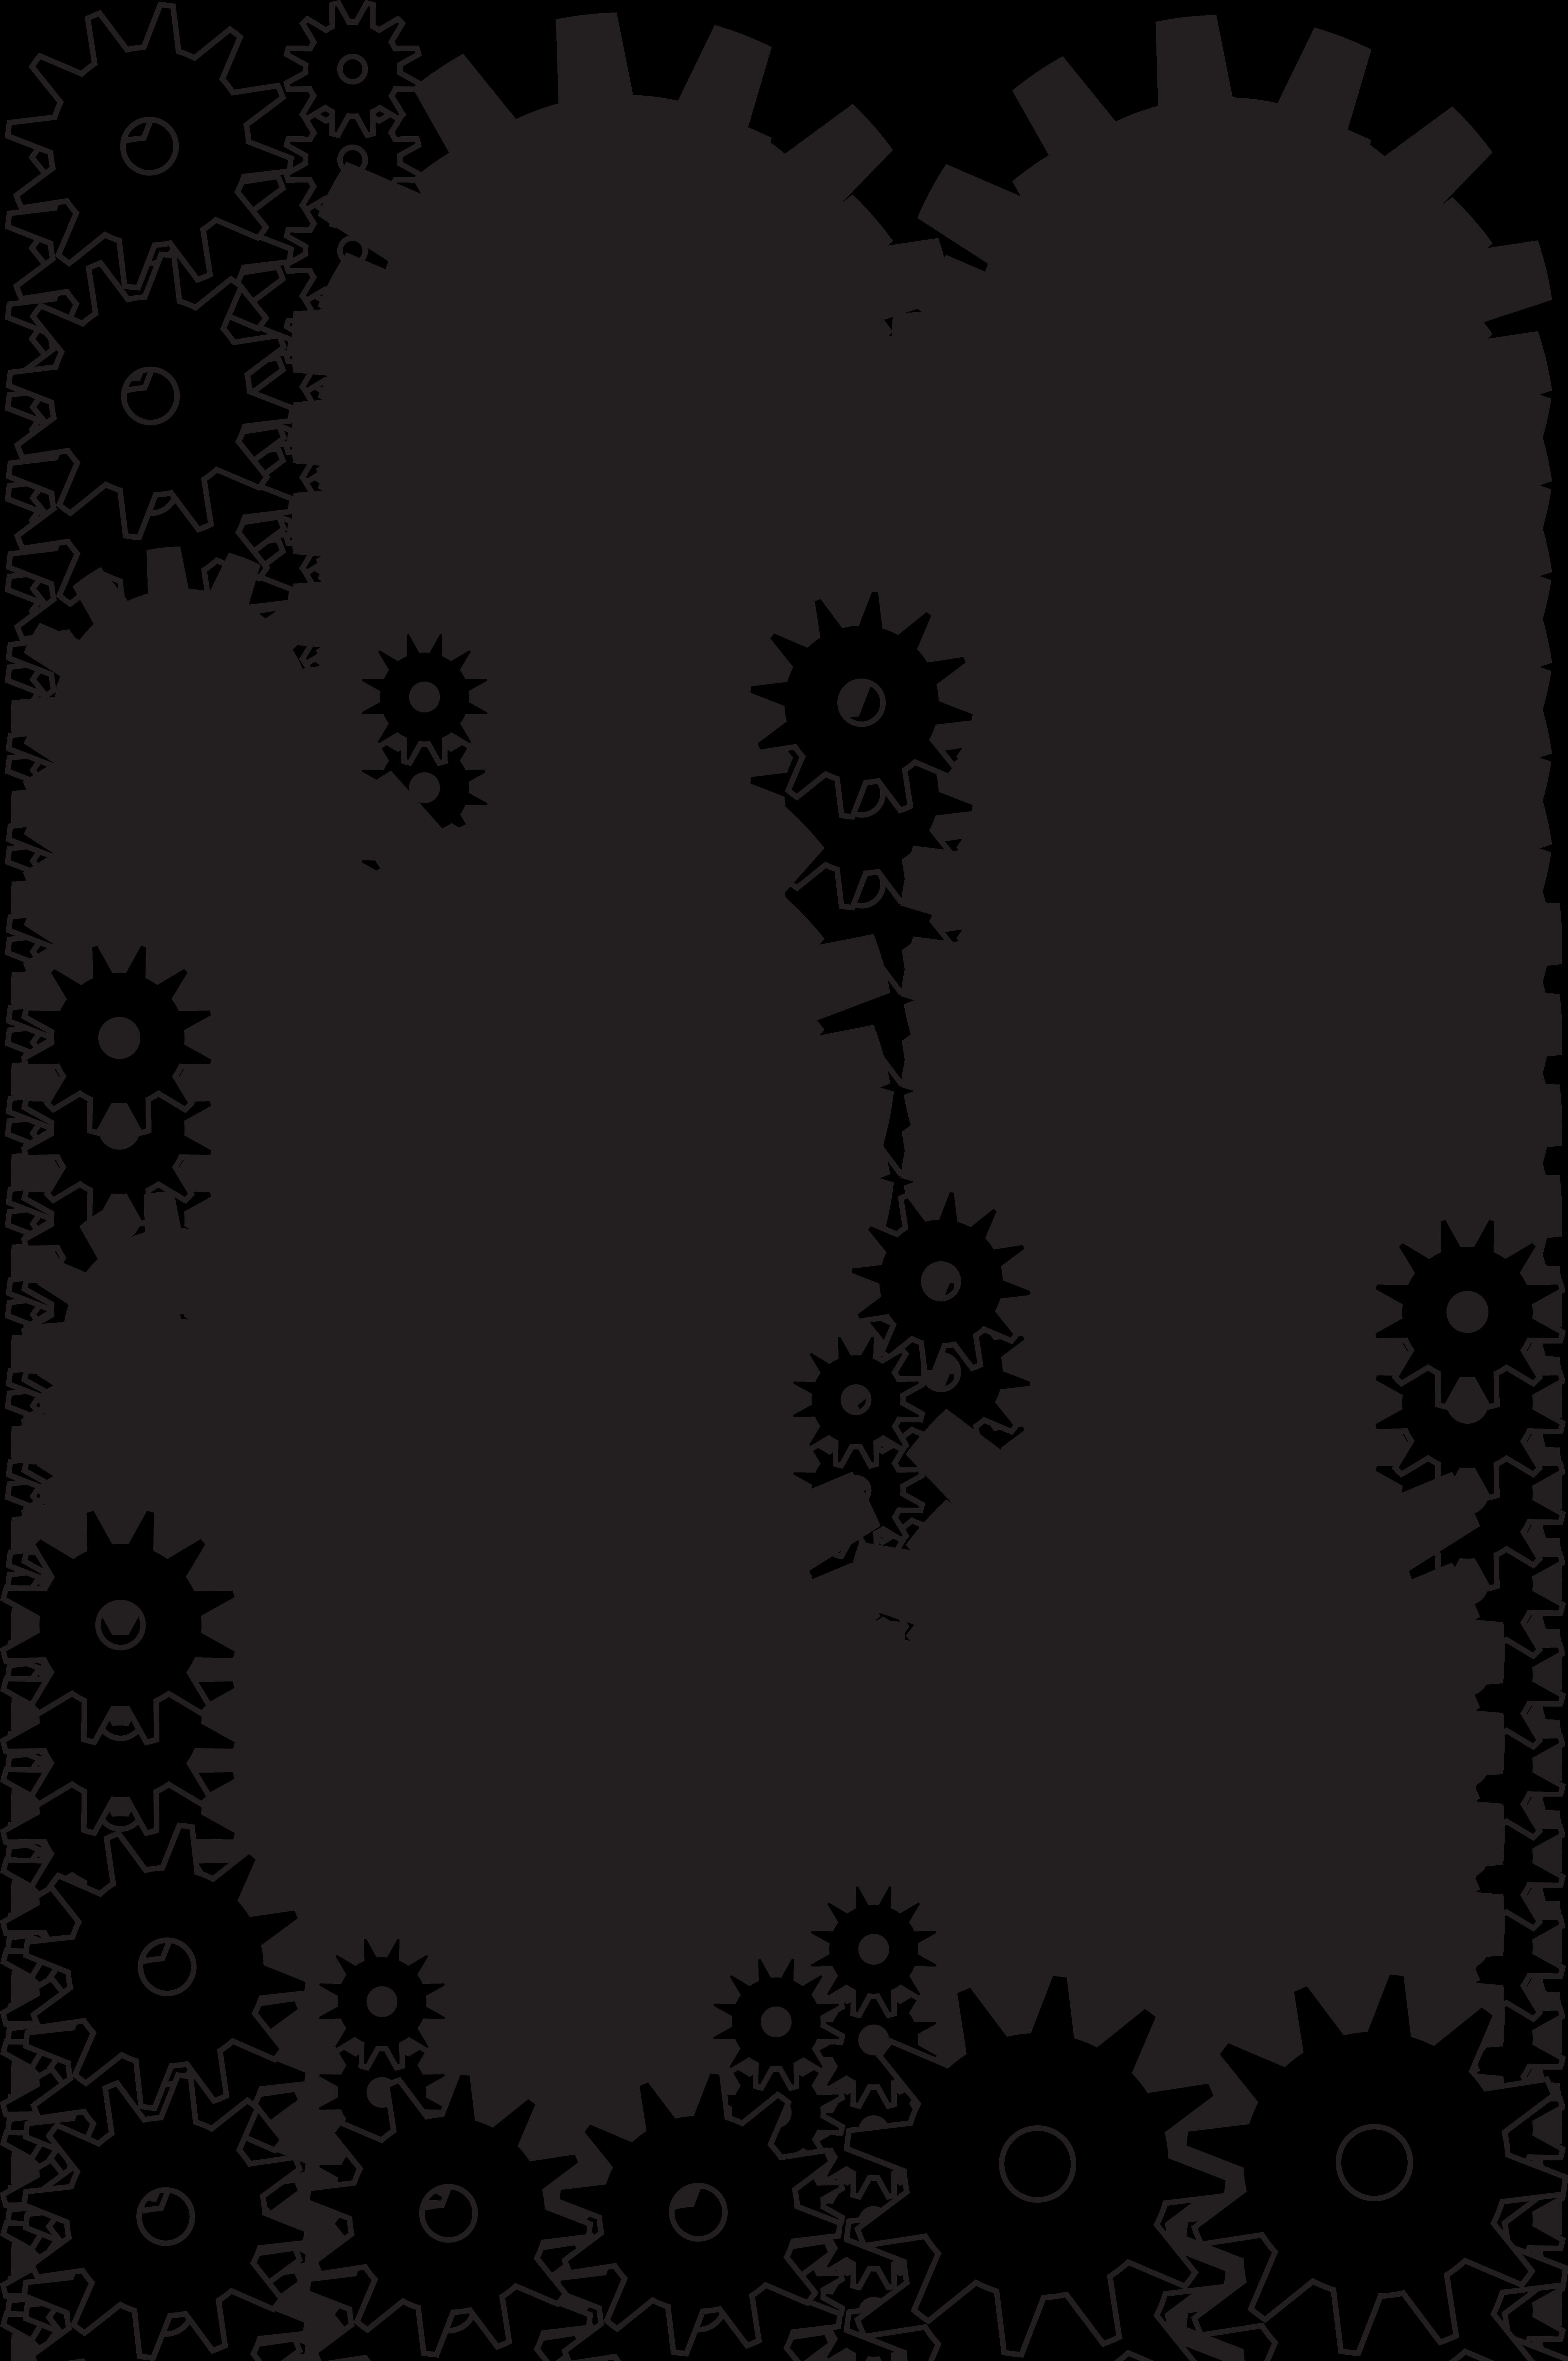 gears cogs free illustrator - photo #24